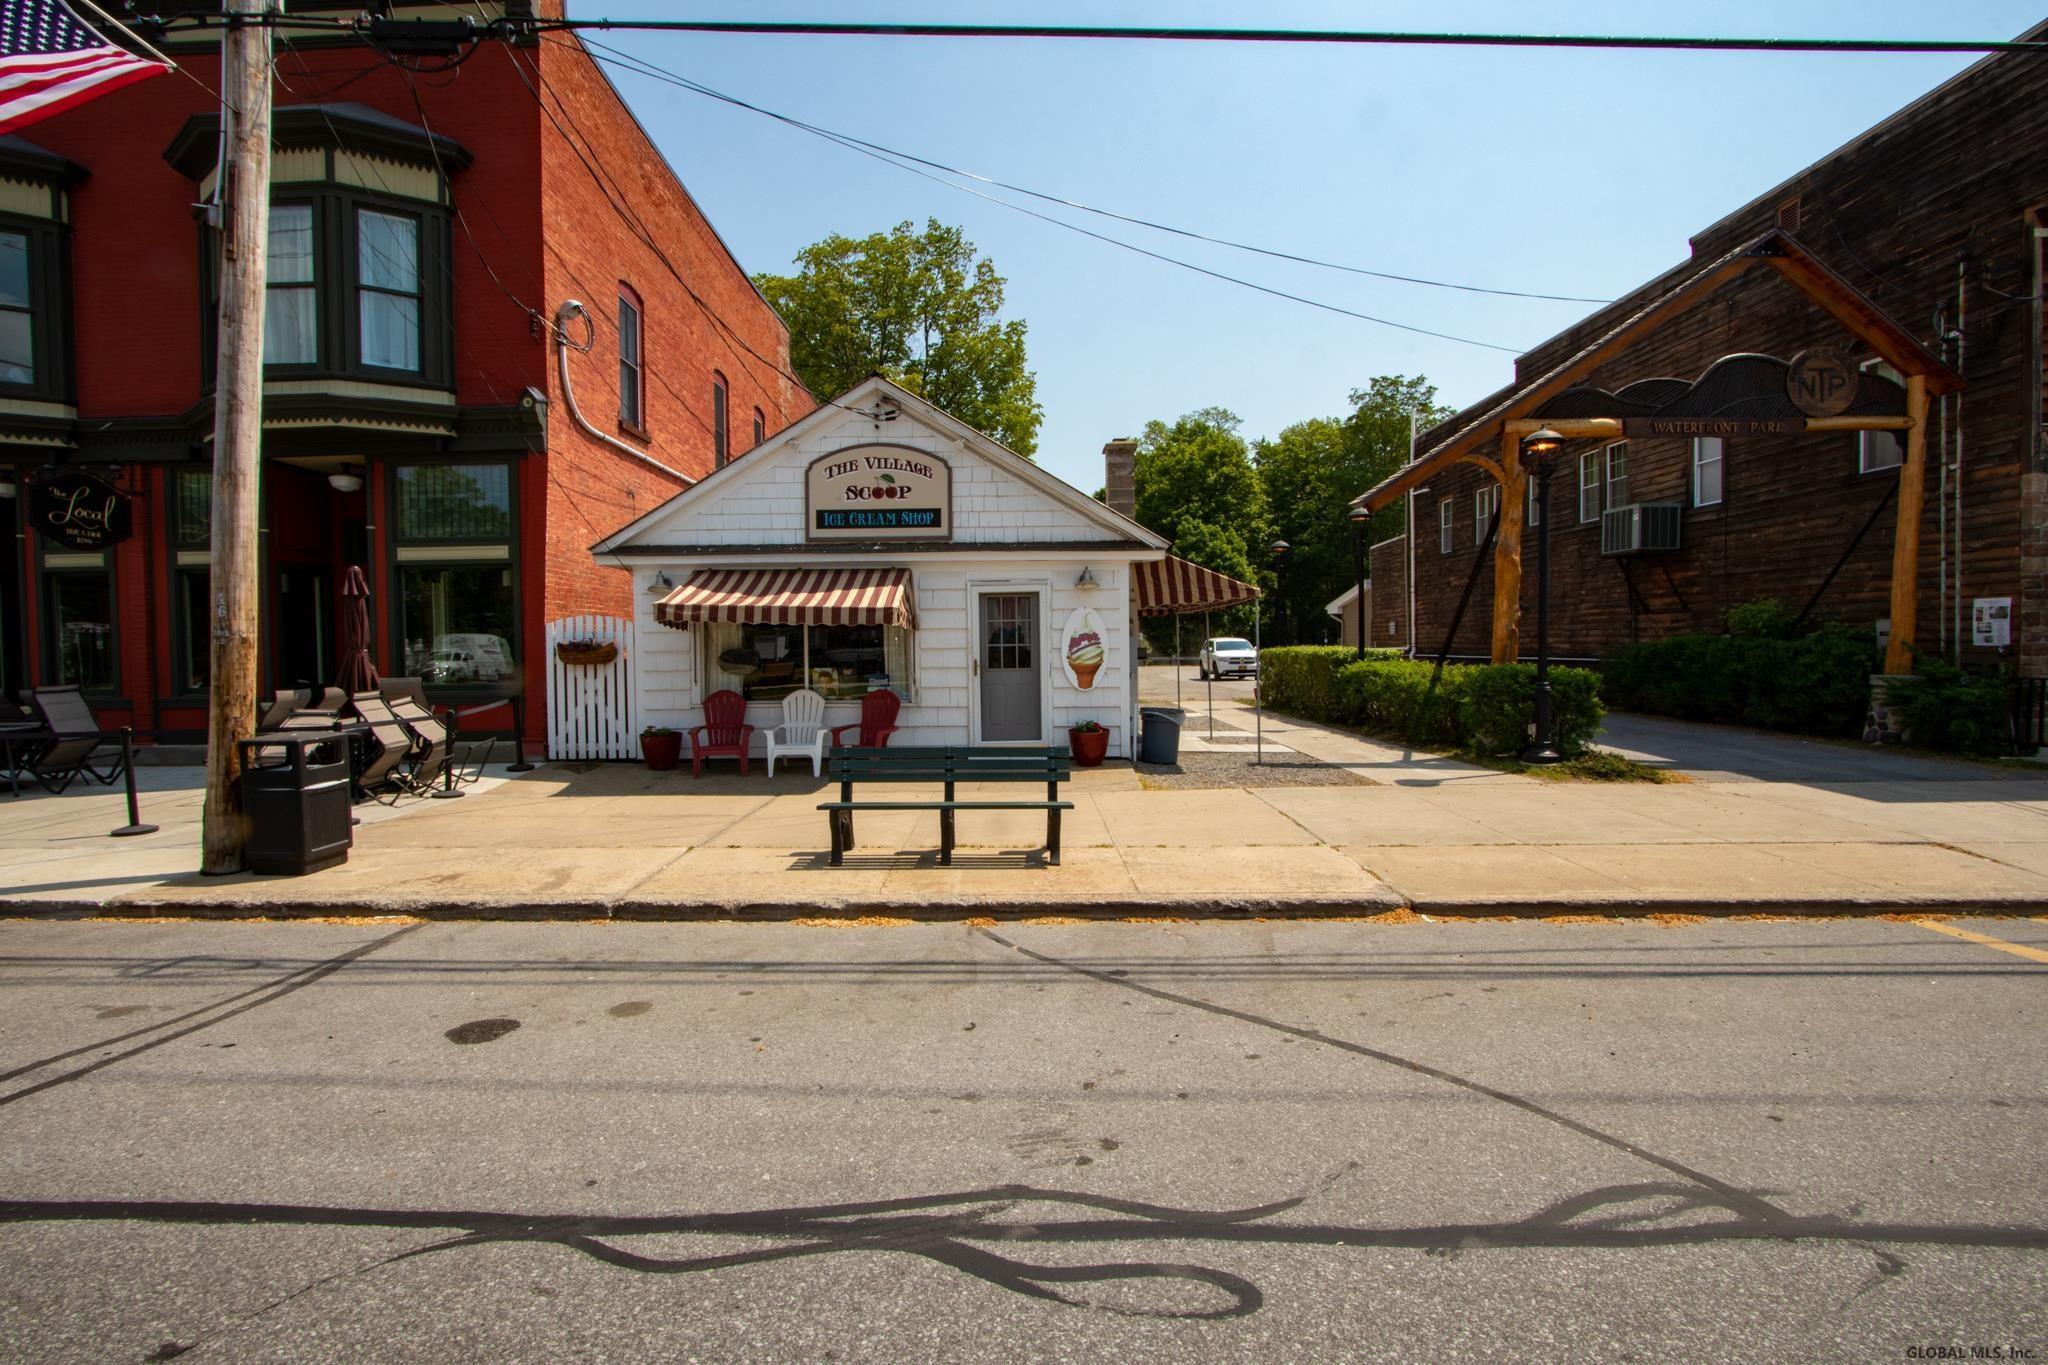 Northville image 30